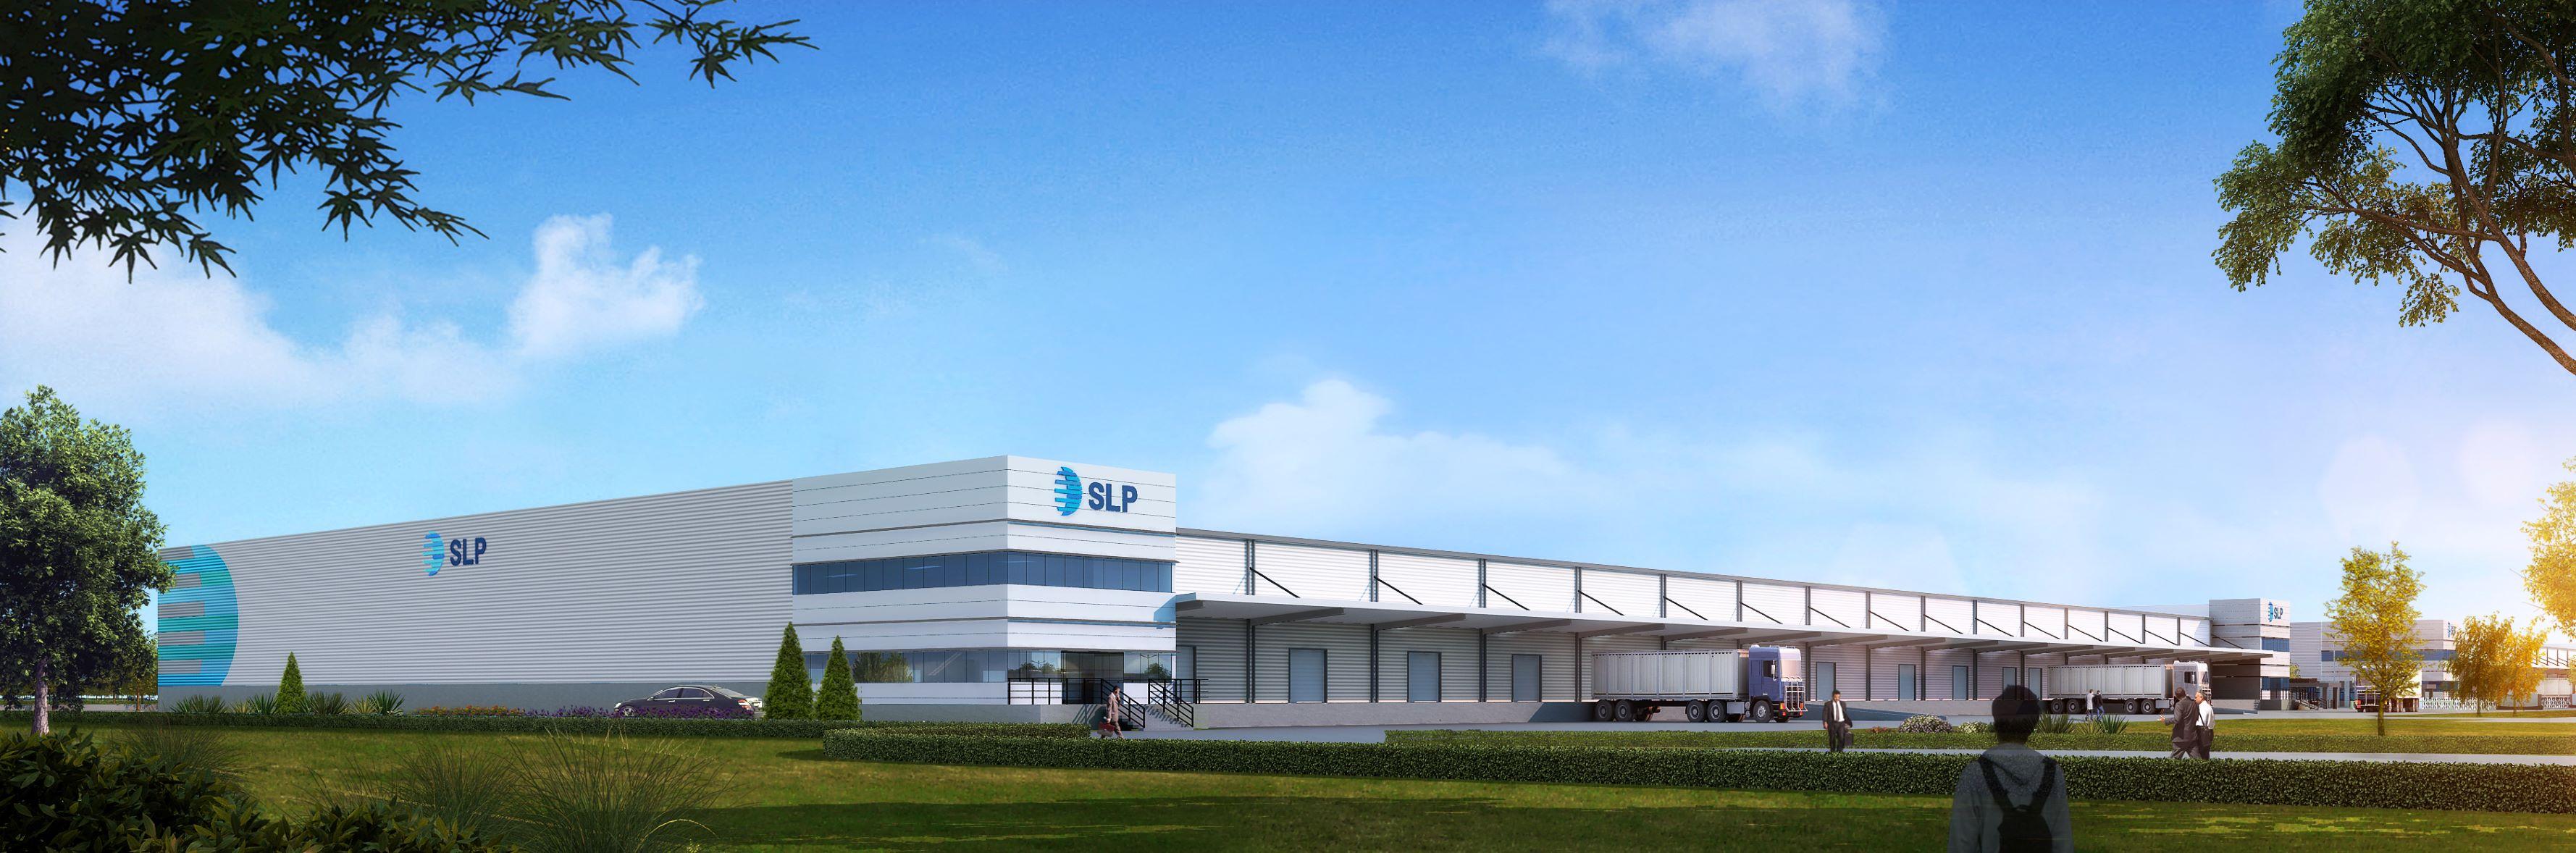 SLP Breaks Ground on Inaugural 89000 SQM Logistic Development in Vietnam